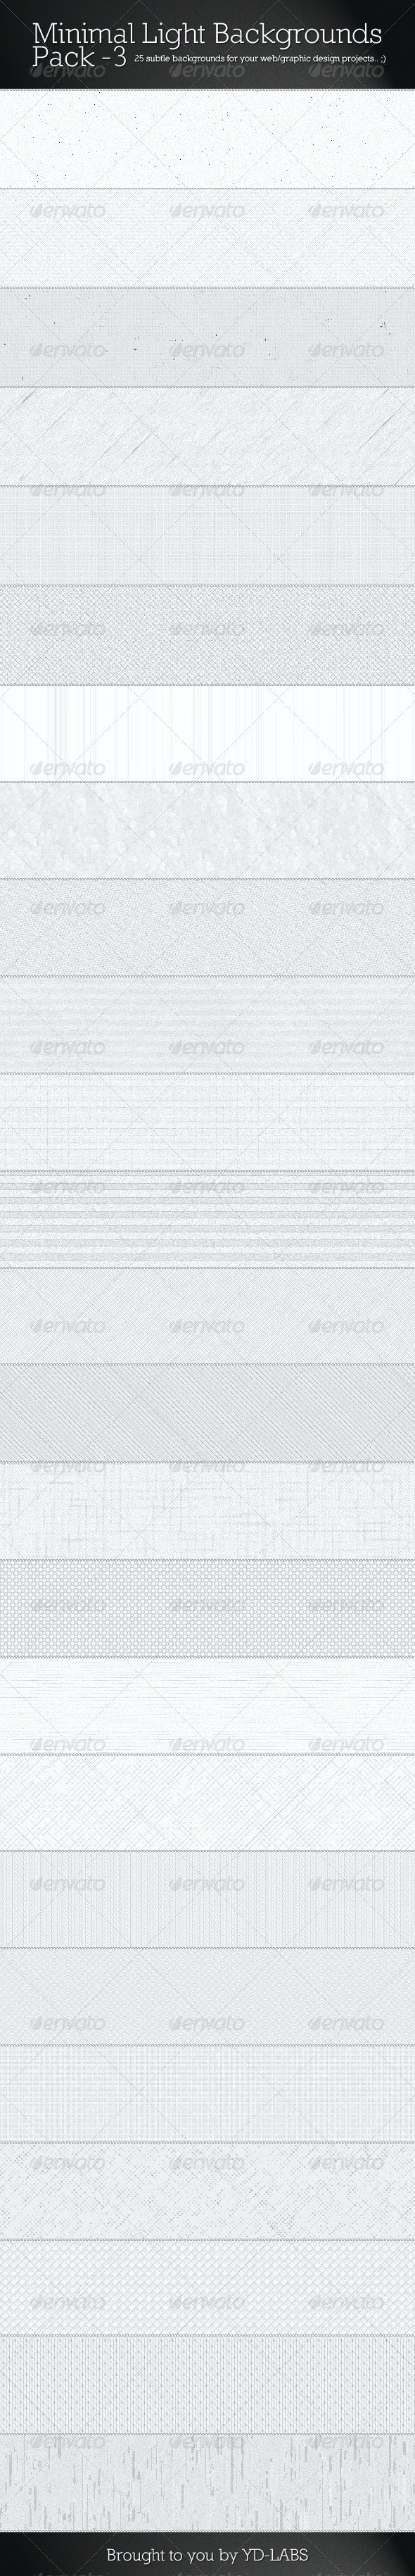 Minimal Light Backgrounds Pack 3 - Patterns Backgrounds